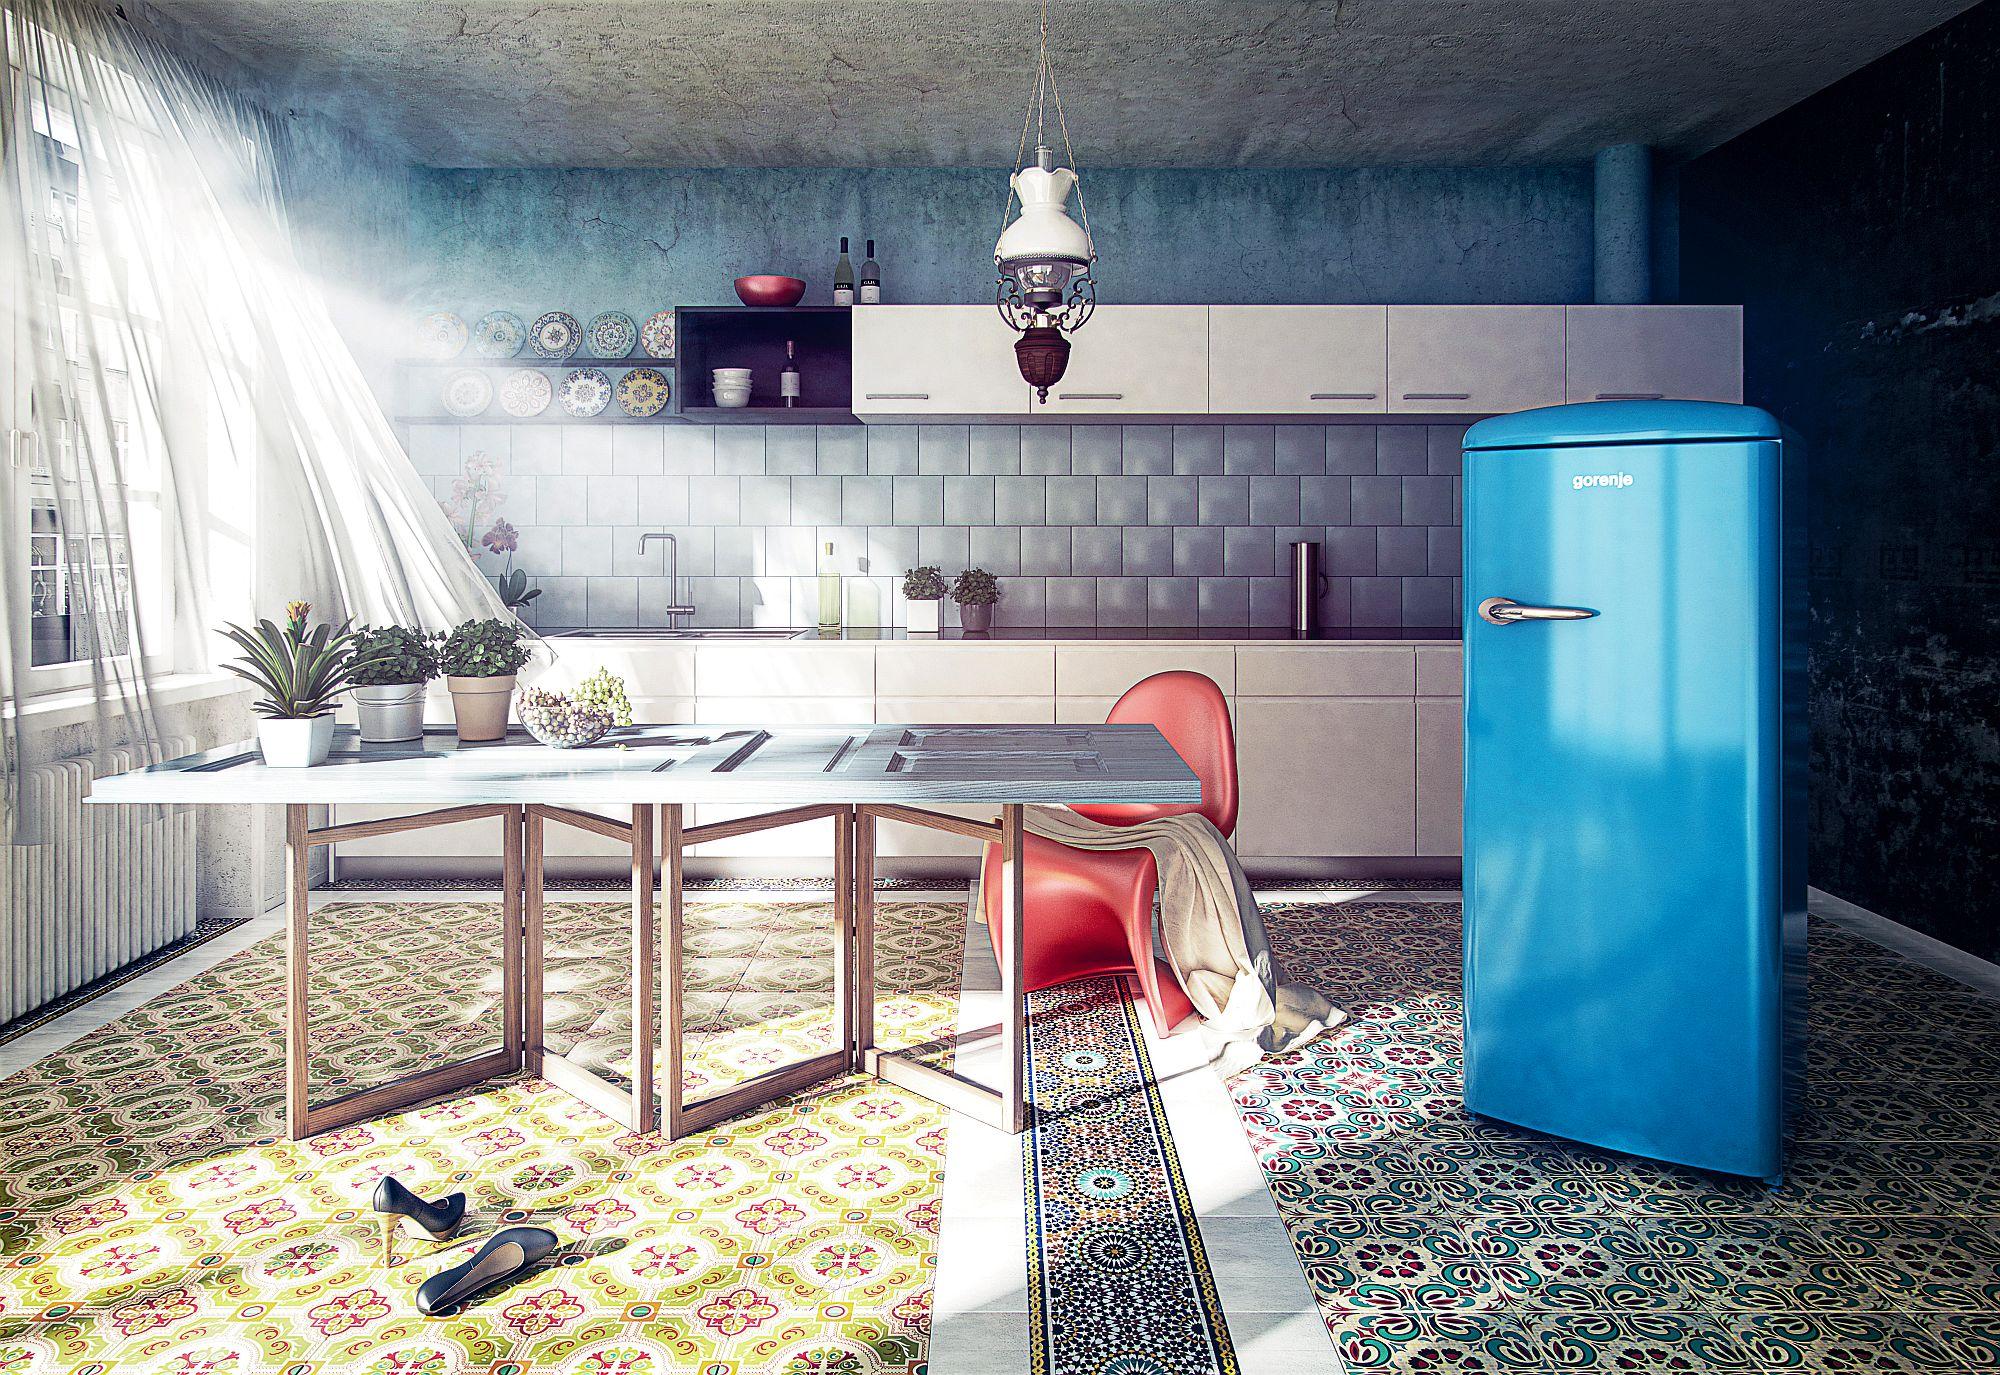 spalivingblog_Gorenje fridge (1)